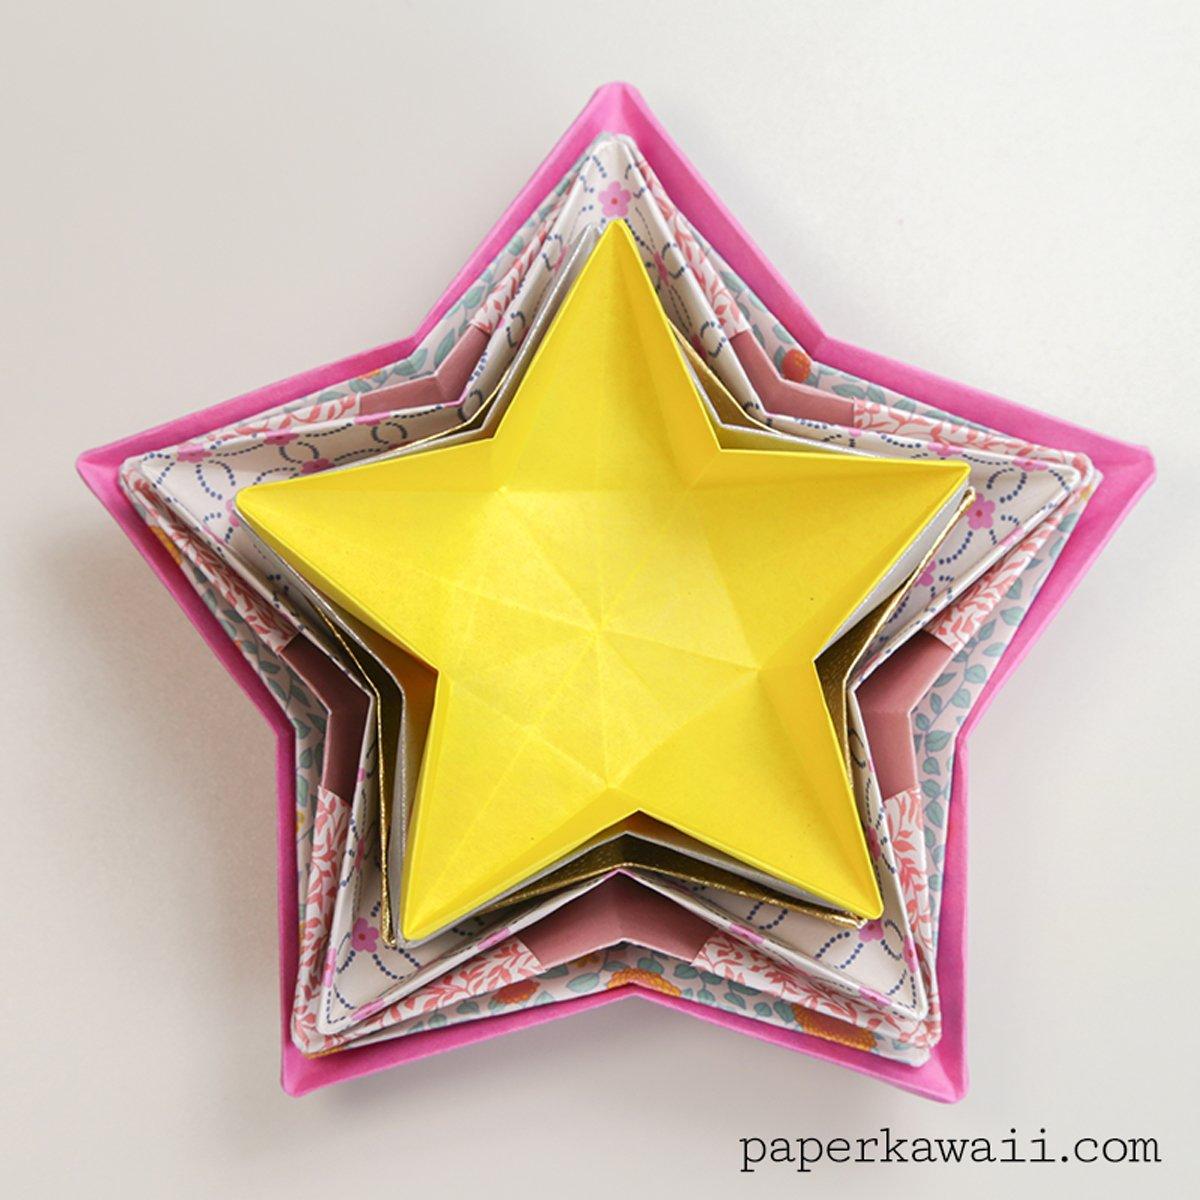 Origami Star Bowl Instructions - Paper Kawaii - photo#23